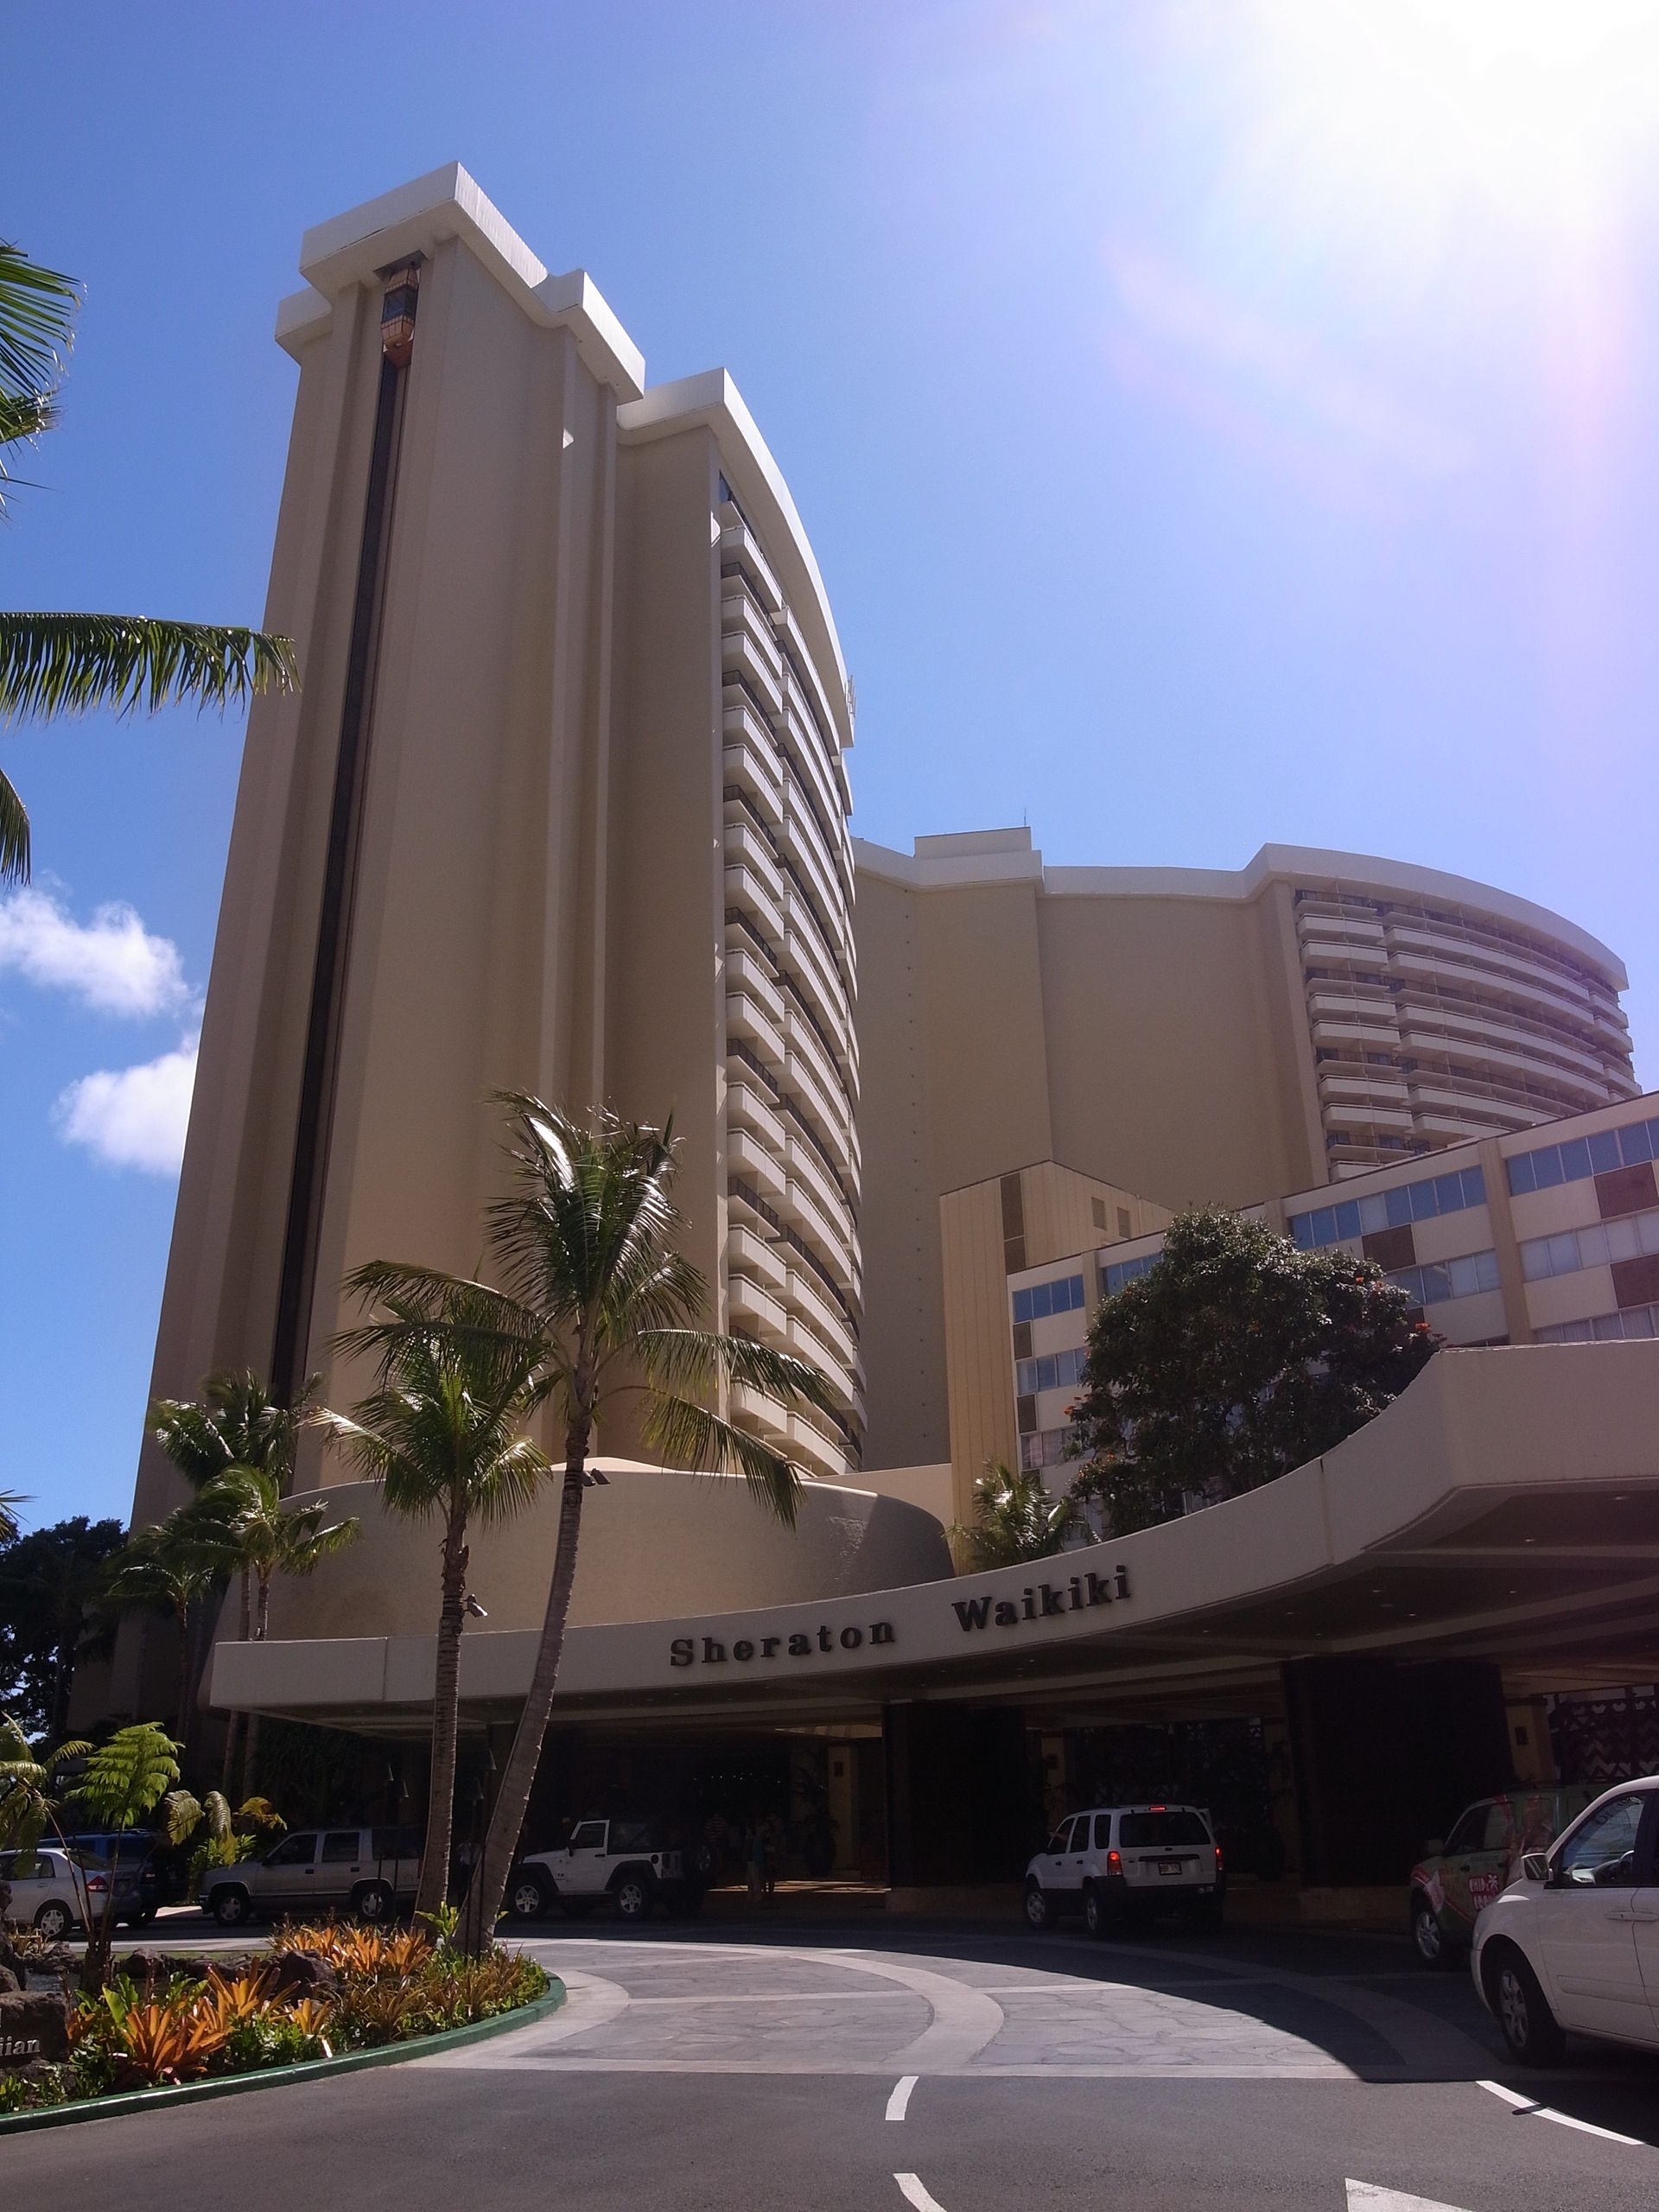 Sheraton Waikiki Hotel Wikipedia